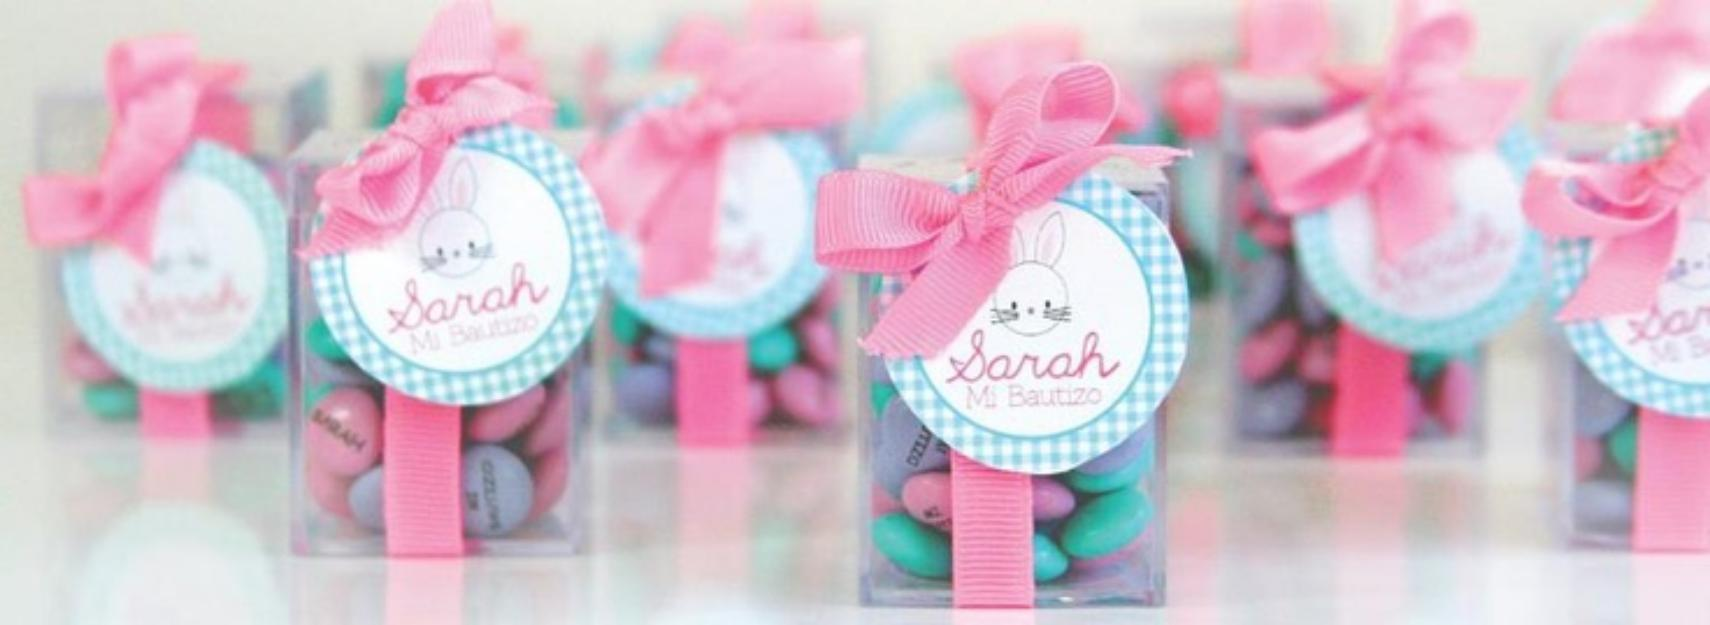 Cajitas-para-recuerdos-decoradas-20140924034425